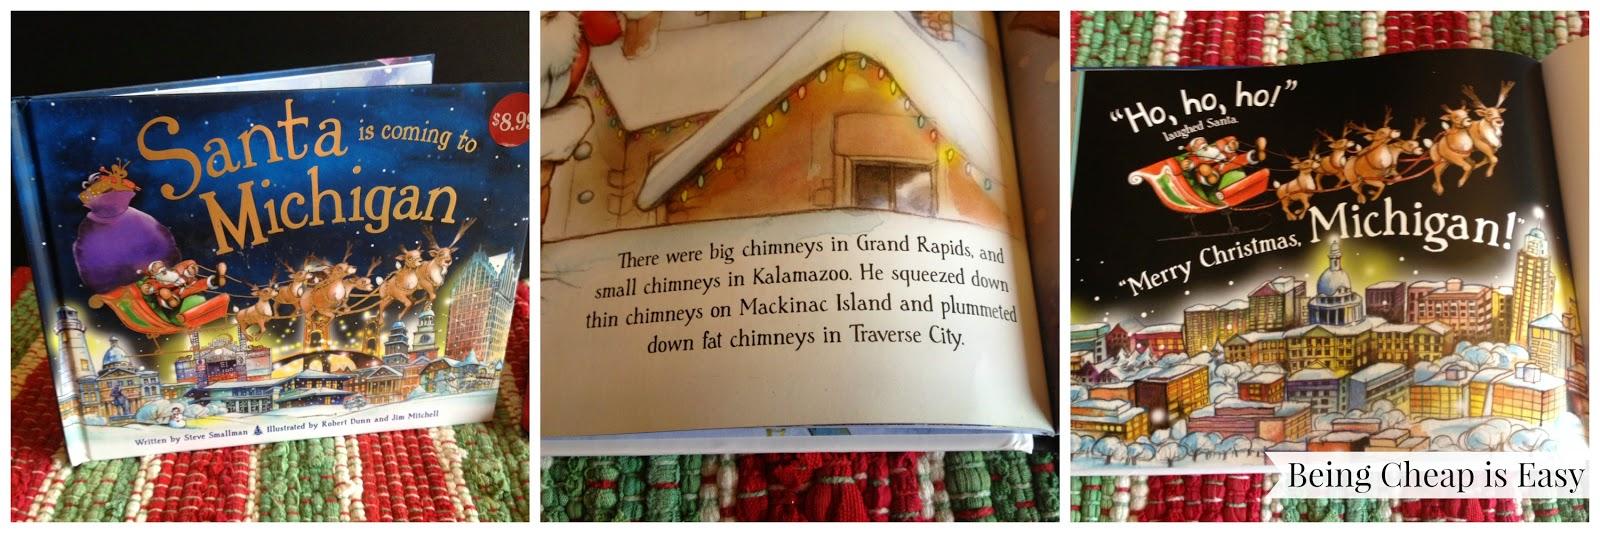 Michigan holiday books, Christmas Books, #NorthpoleFun, Hallmark, Walmart, Northpole, Santa in Michigan